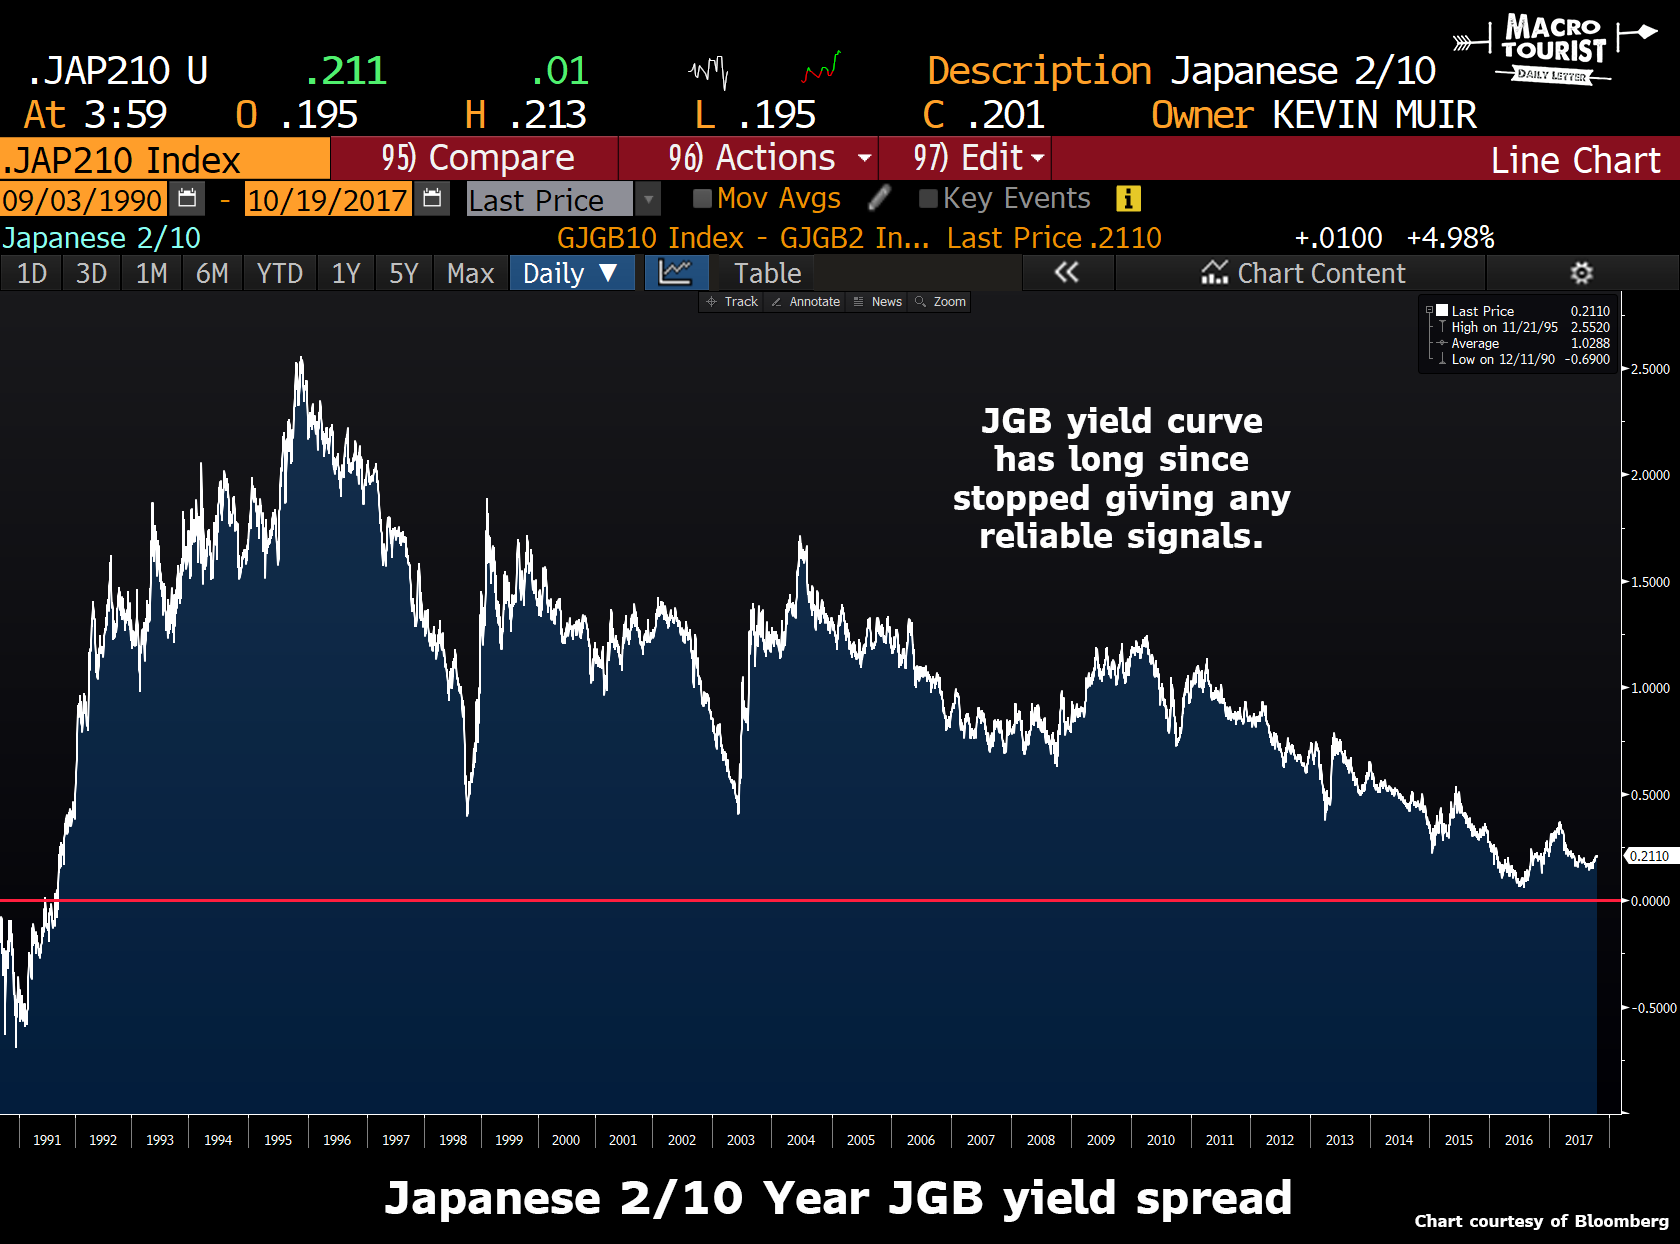 JGB Yield Curve, 1991 - 2017